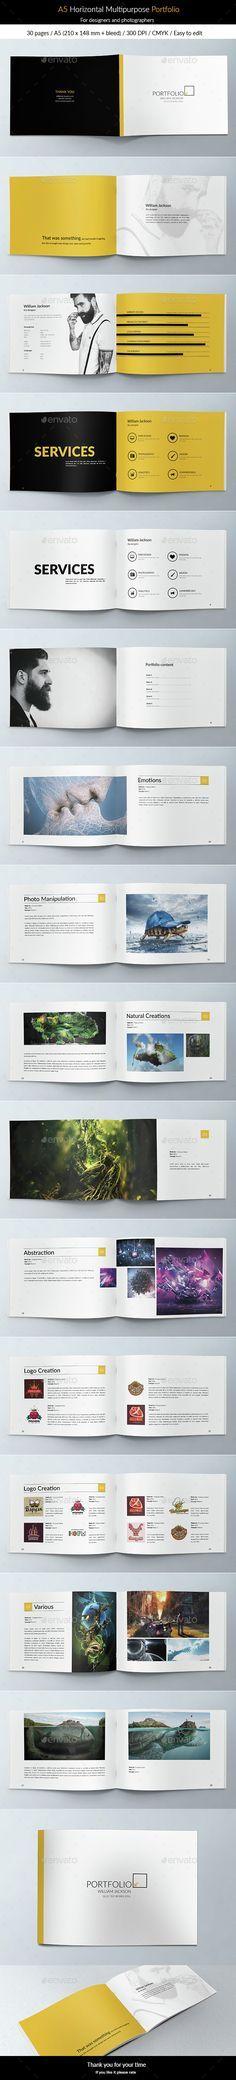 A5 Horizontal Multipurpose Portfolio Brochure Template A5 And